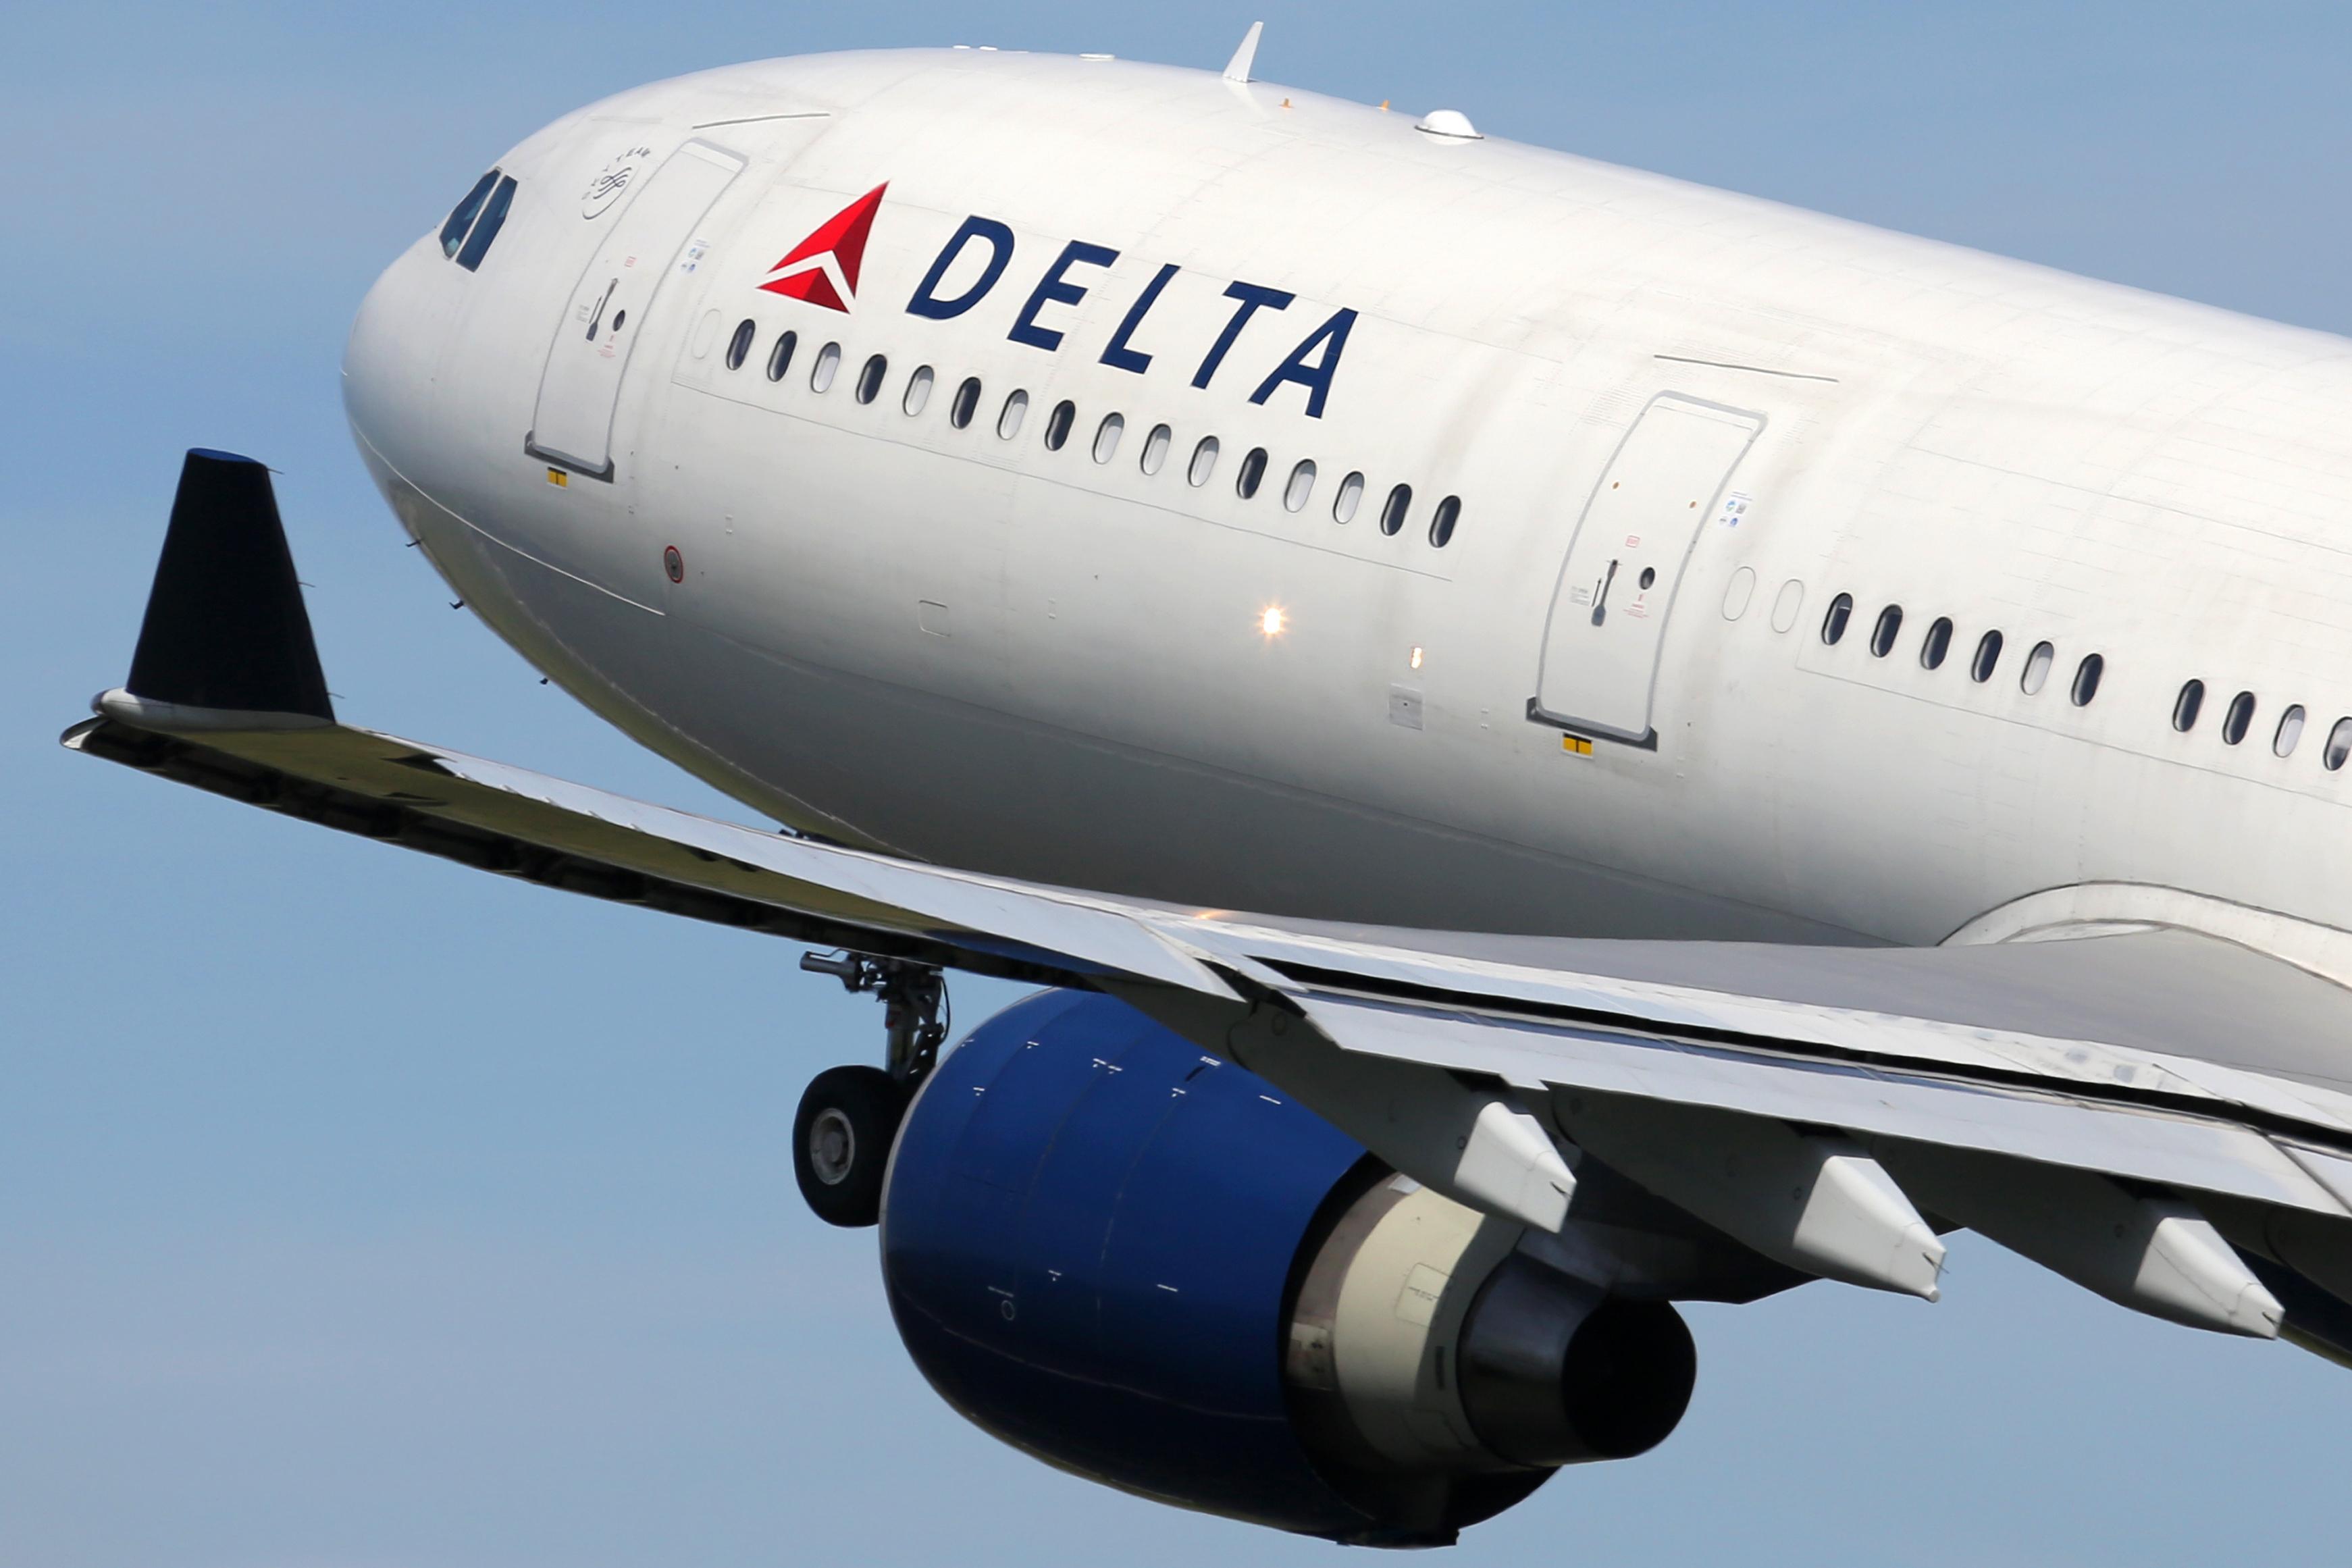 customer service, commitment, qbq, accountability, delta airlines